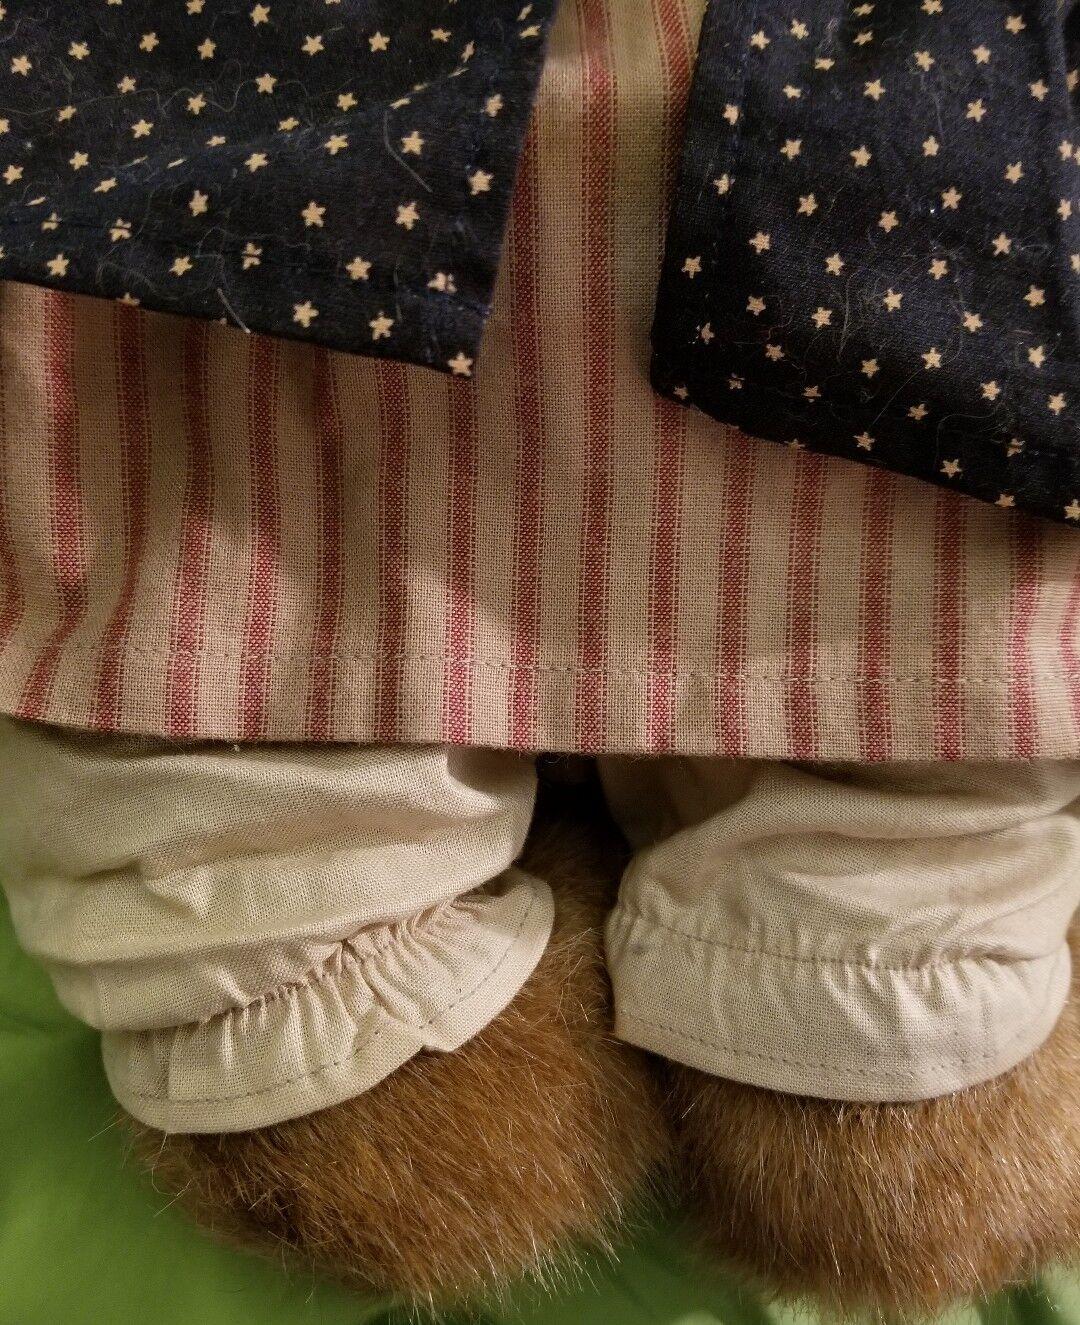 Boyds Bears Bears Bears Betsy B. Bearyproud  999869V QVC Exclusive Plush Stuffed Animal 16